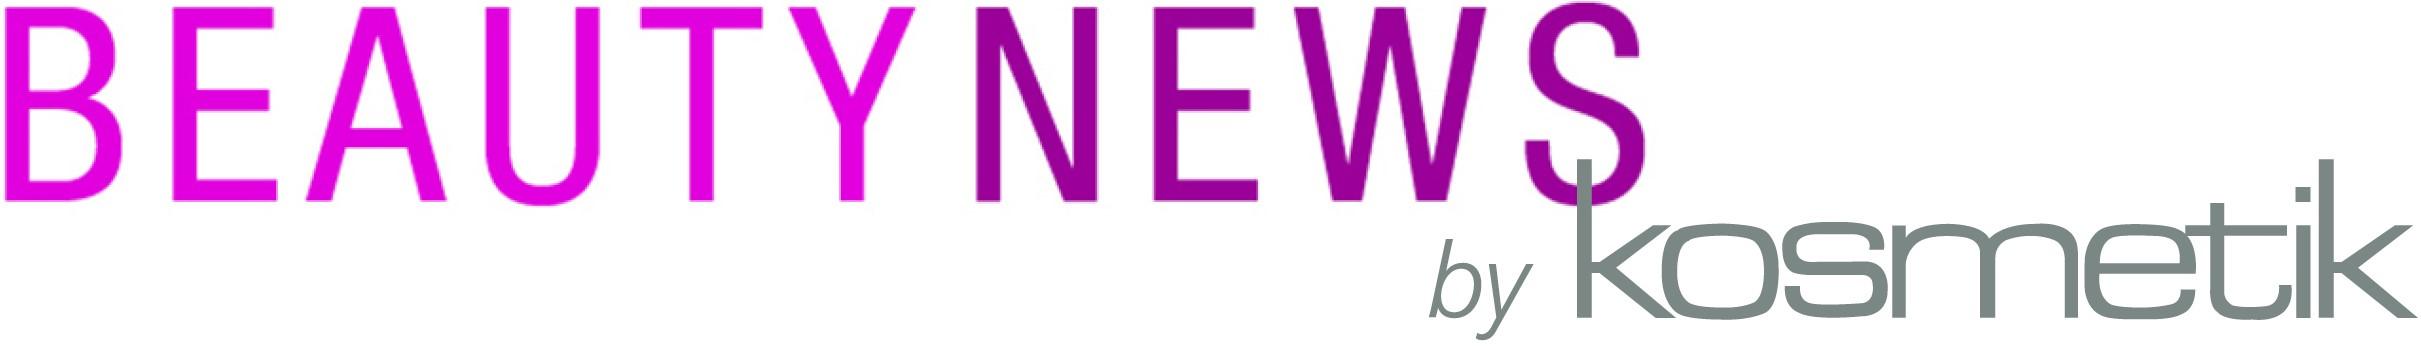 Beautynews logo